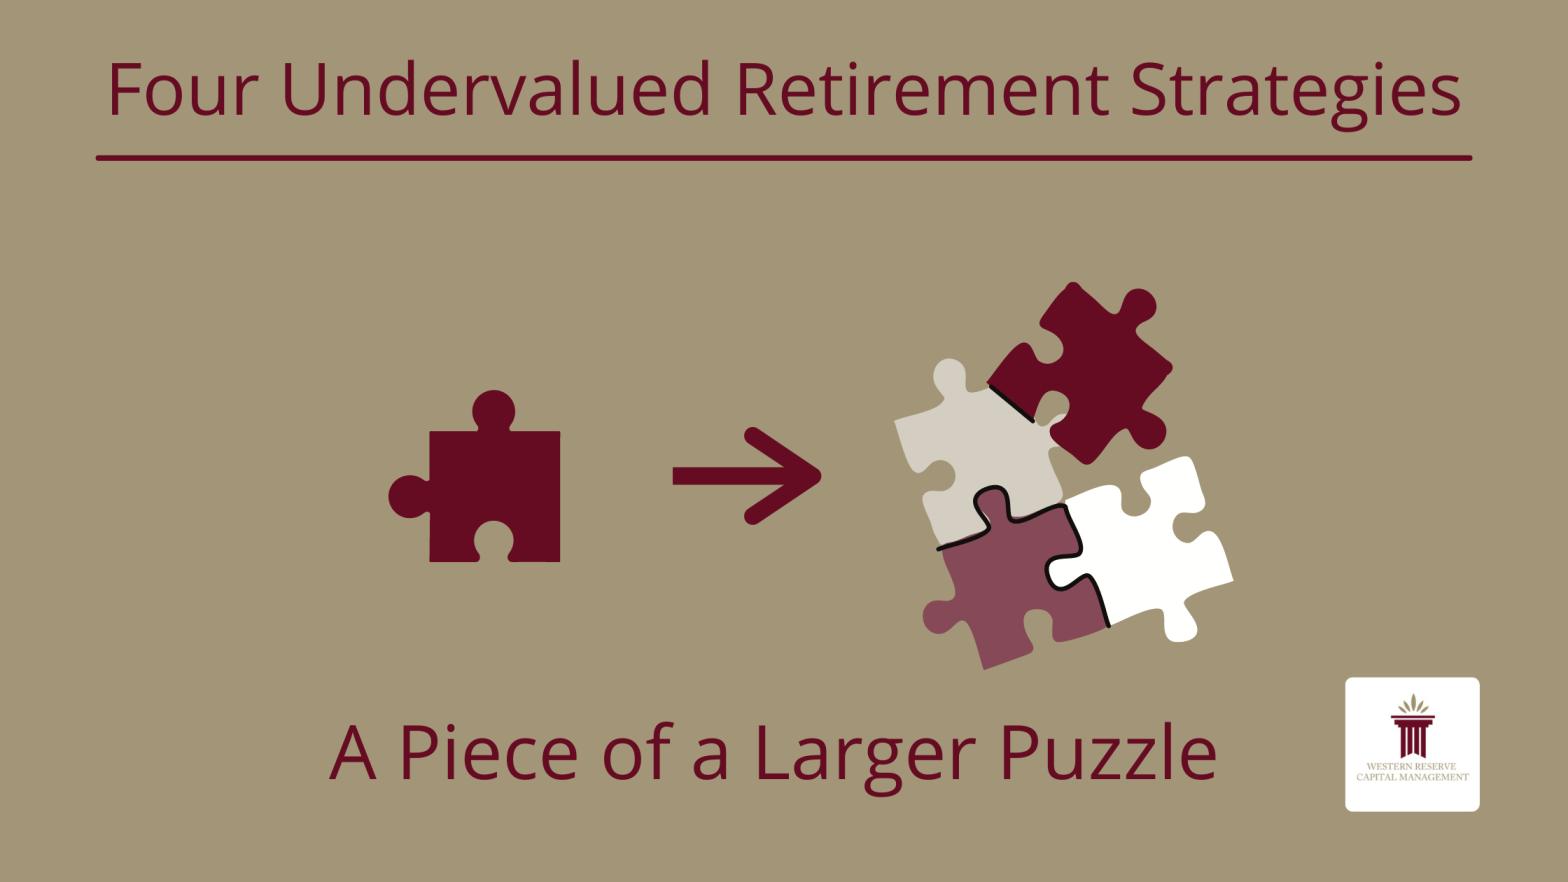 Four Undervalued Retirement Strategies